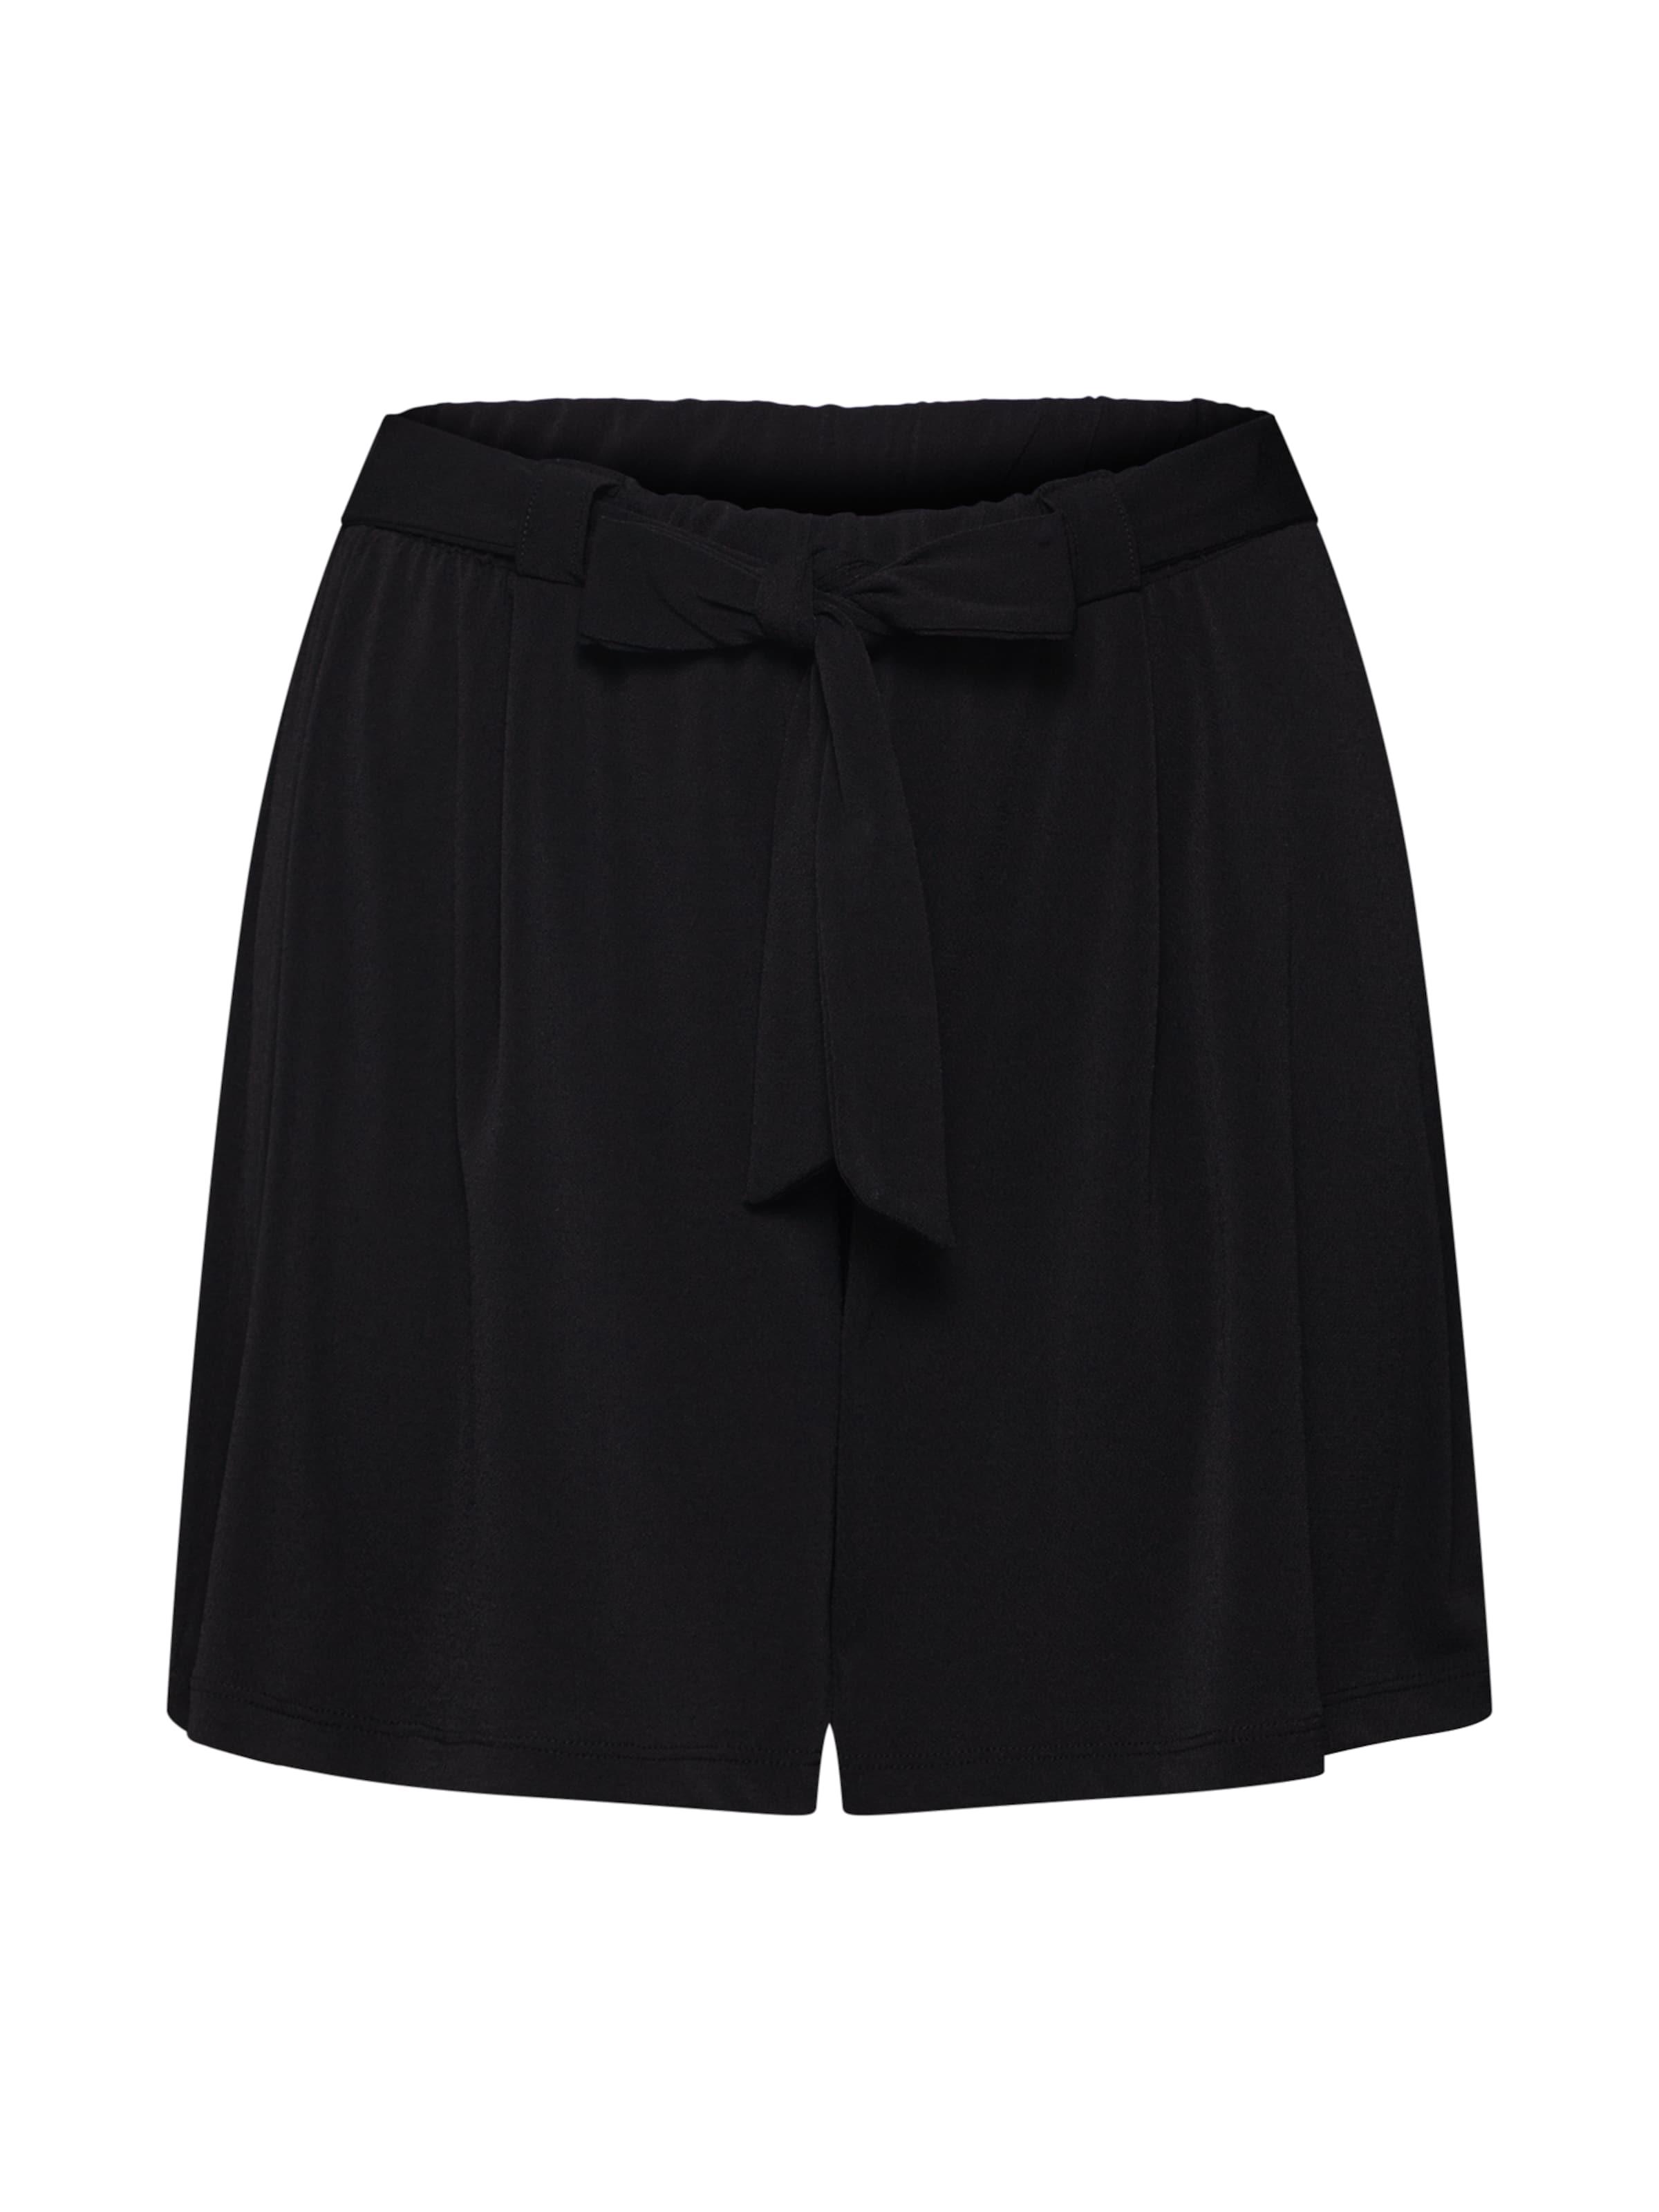 Shorts About In Schwarz 'vivien' You 3lJc1TKF